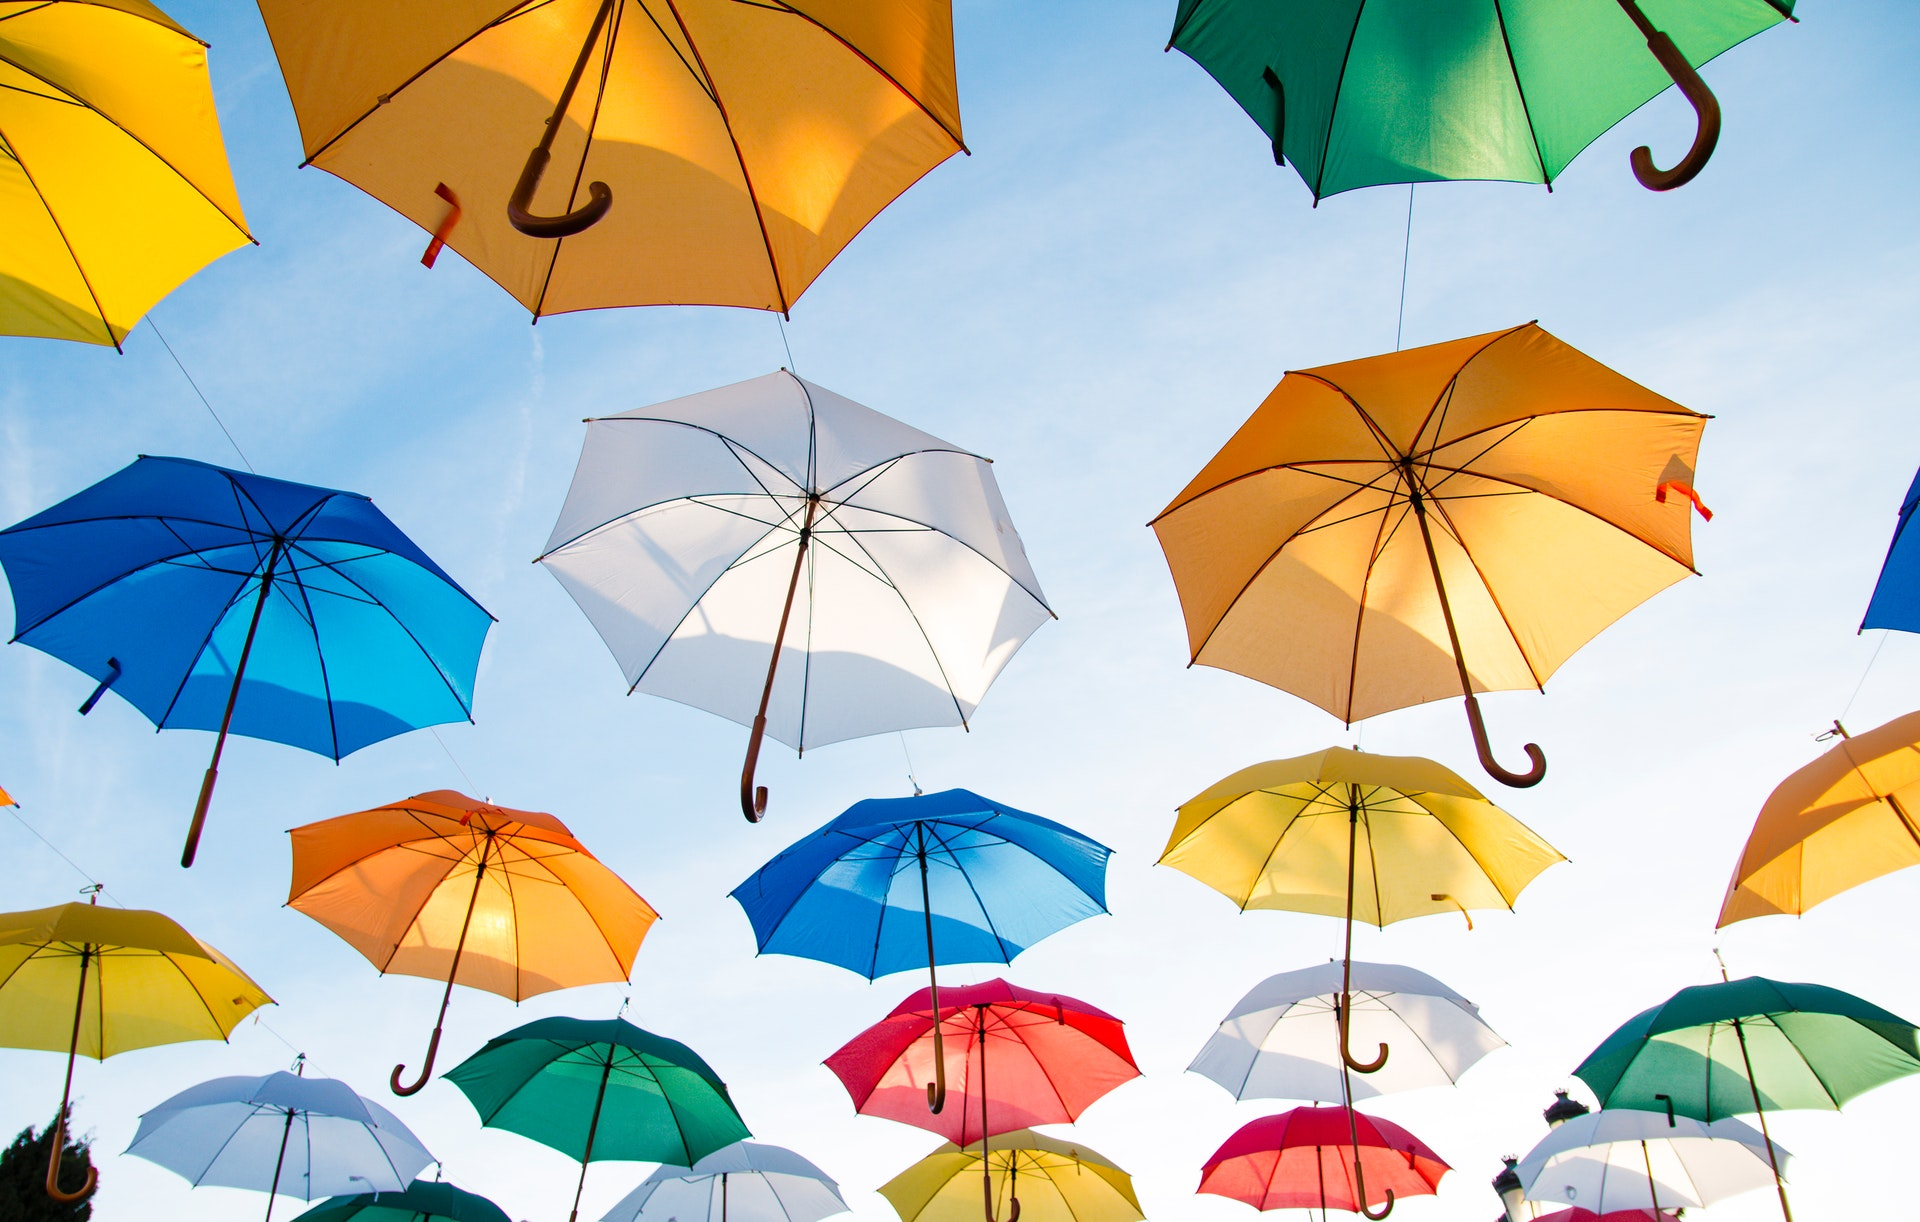 coya insurances overview